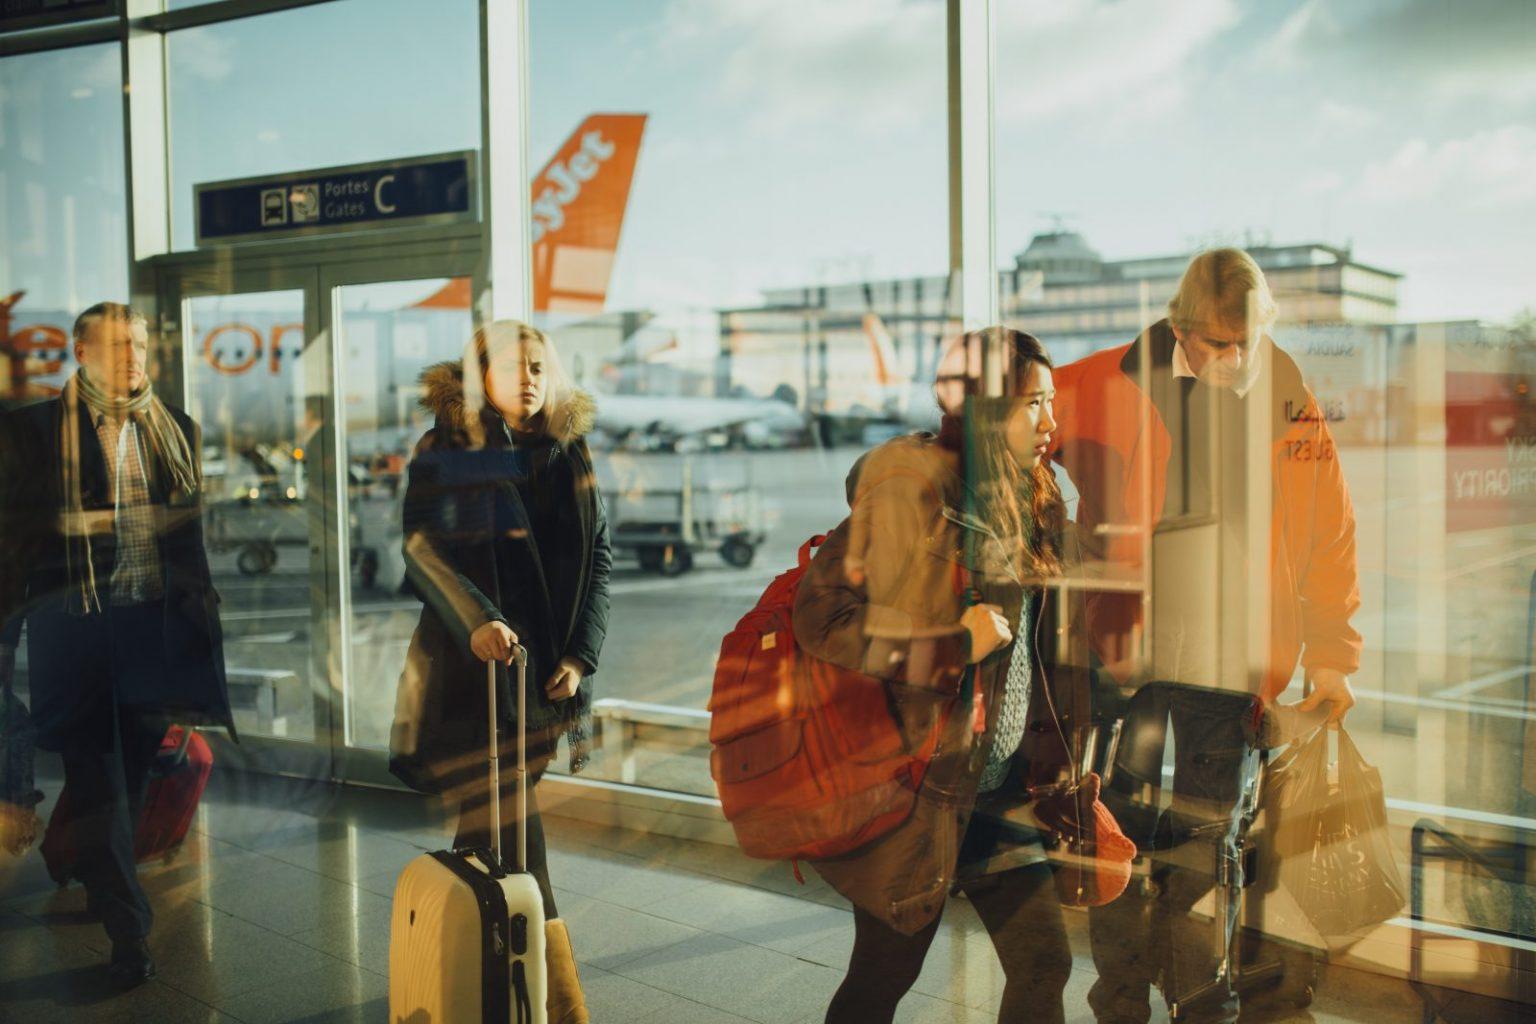 Medical Professional Addresses Travel Industry Concerns regarding Covid-19